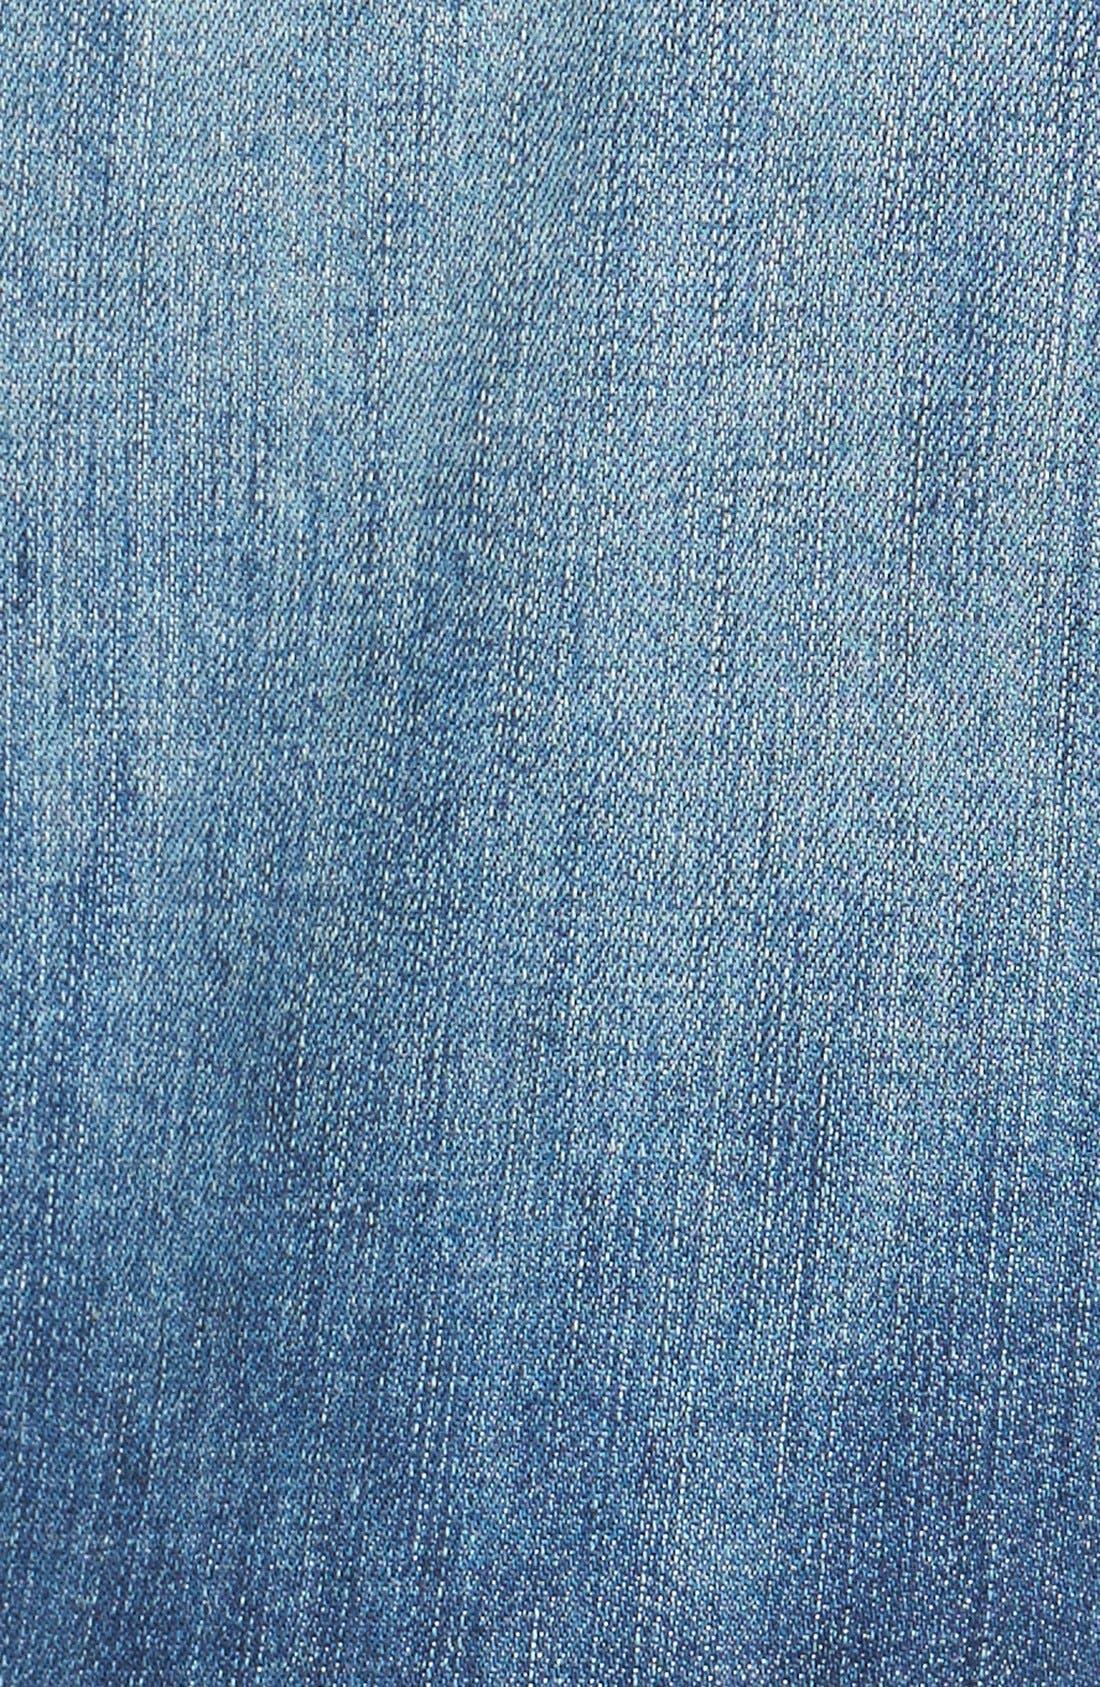 Alternate Image 4  - KUT from the Kloth 'Helena' Denim Jacket (Regular & Petite)